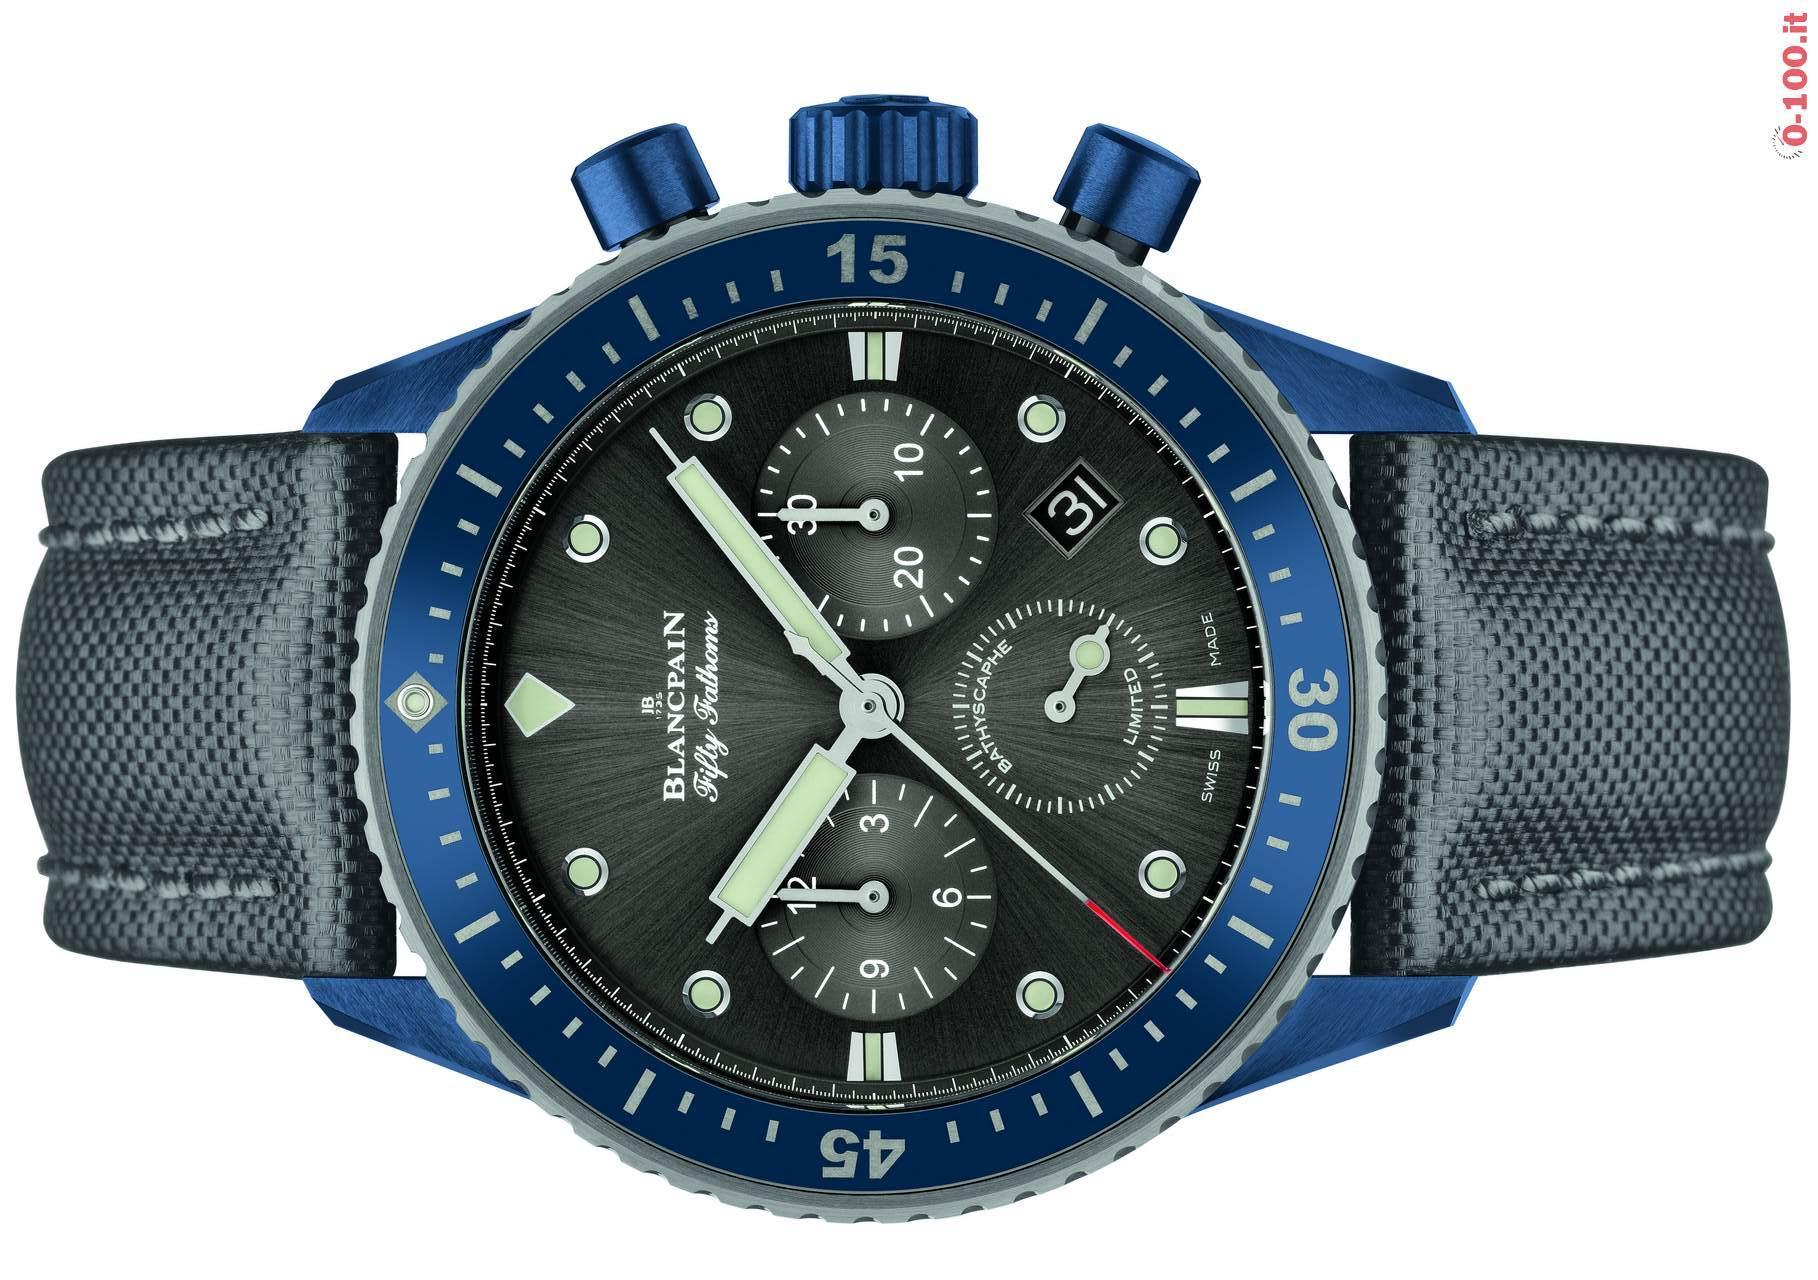 blancpain-bathyscaphe-chronographe-flyback-blancpain-ocean-commitment-ii-prezzo-price_0-1003